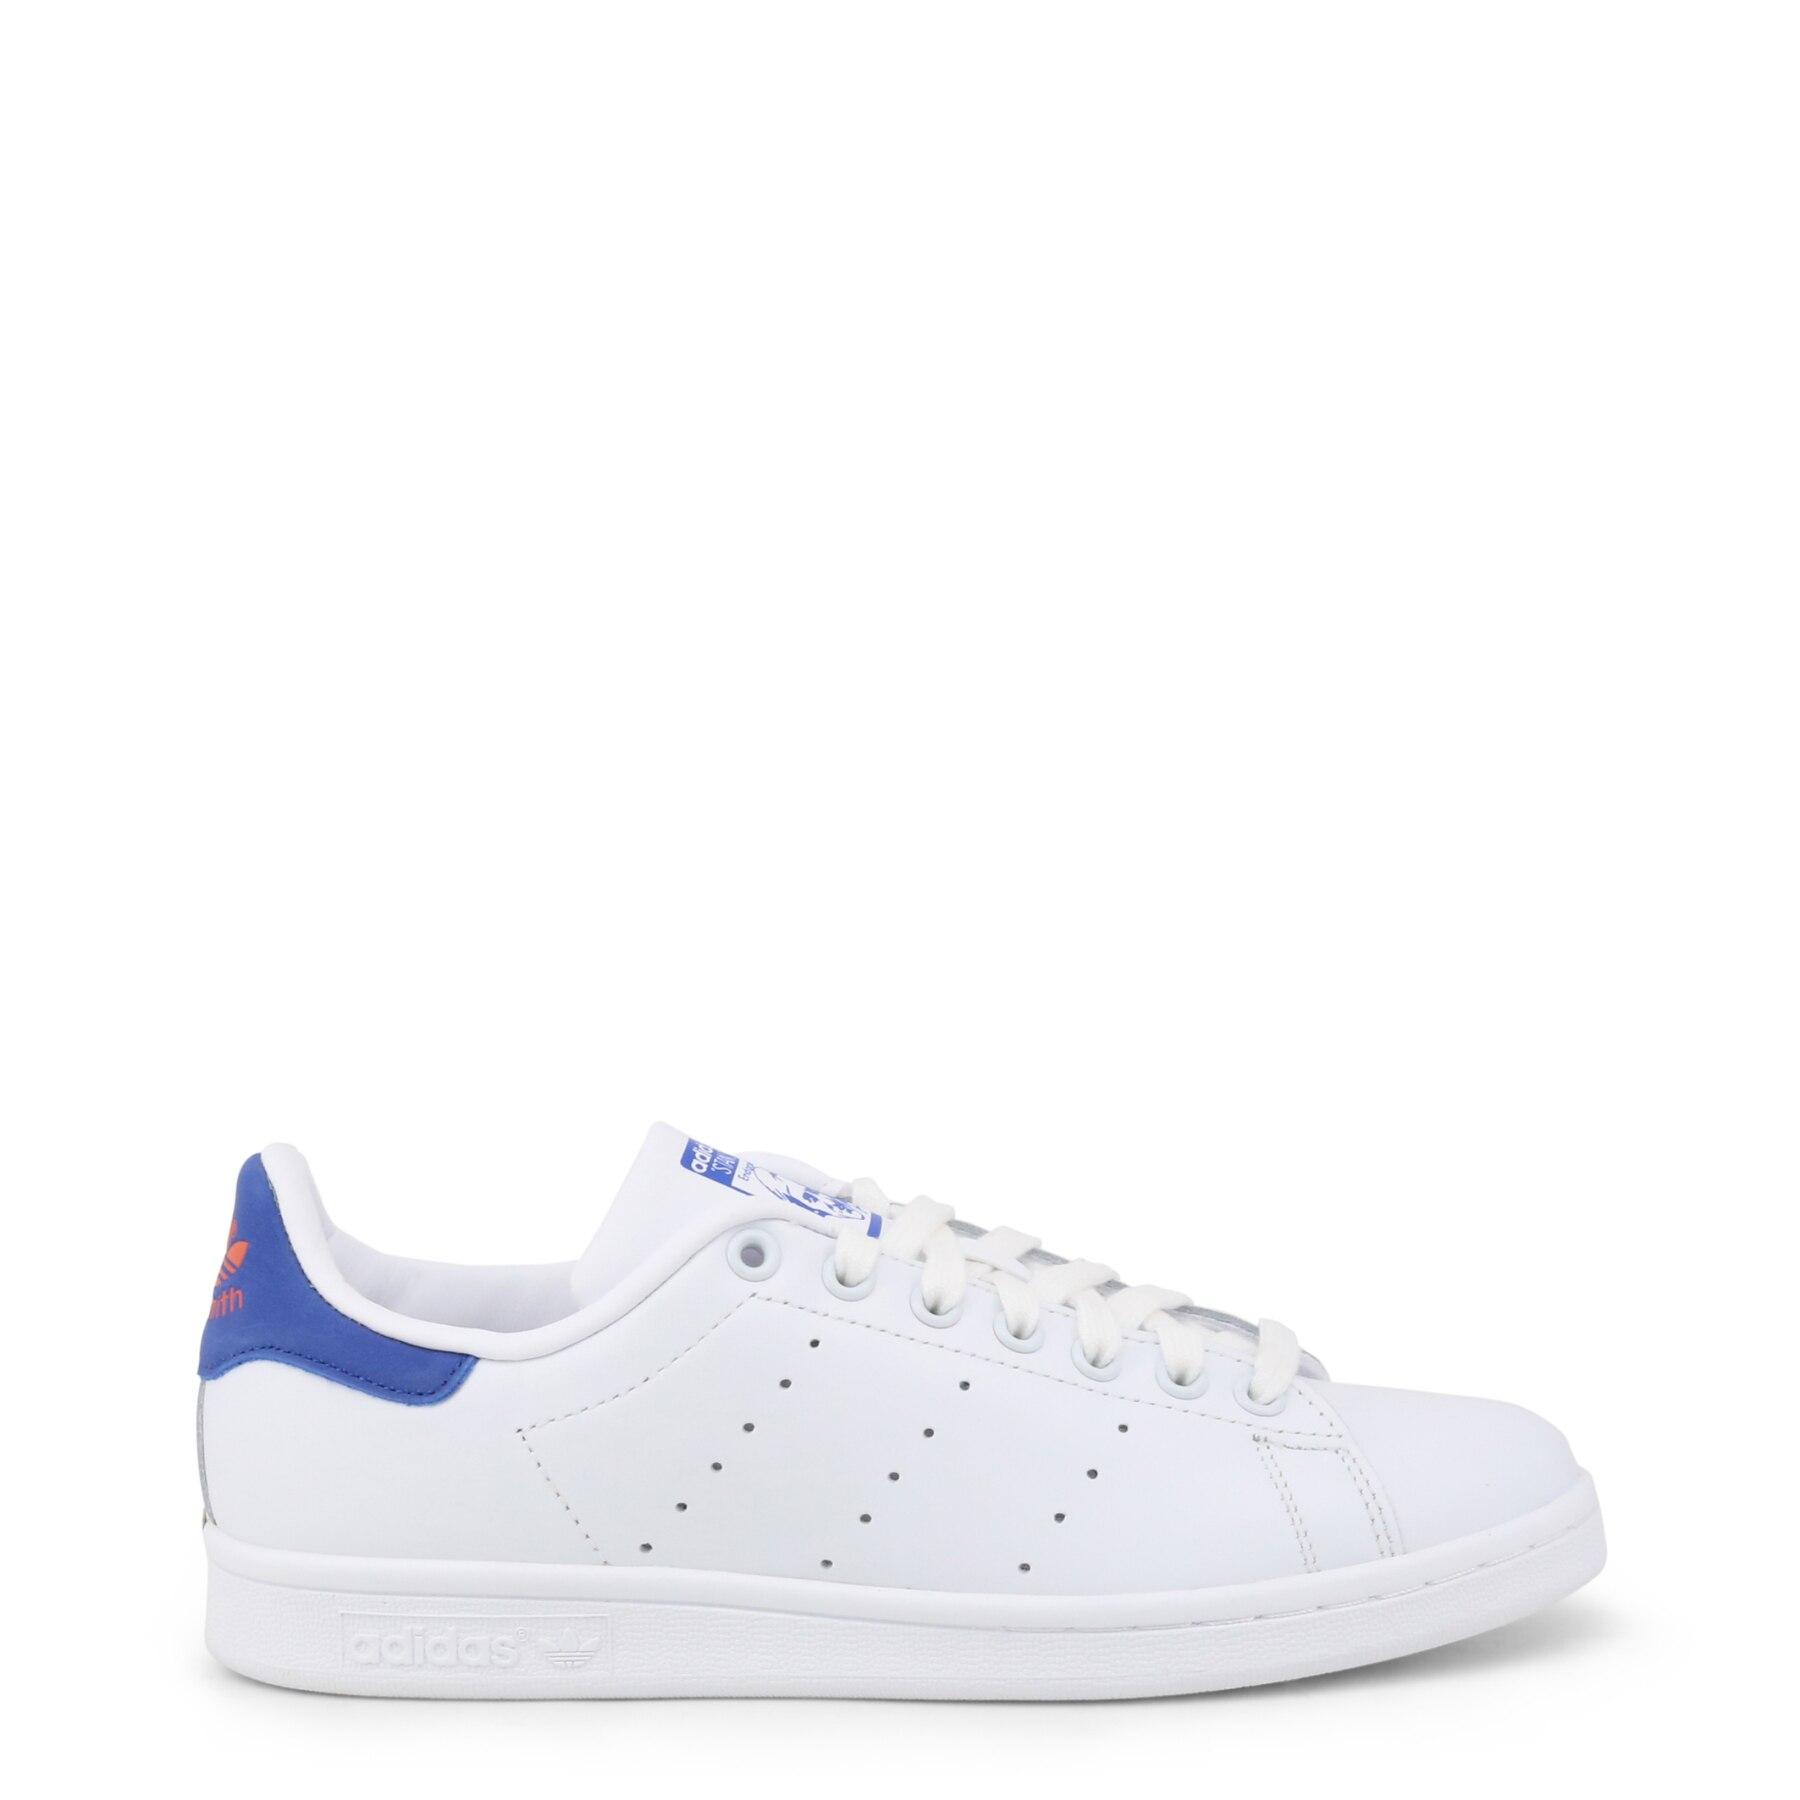 nuevo concepto sobornar auténtico nuevo producto Adidas StanSmith Man White 100696. Color: White, Size: UK 7.0 ...